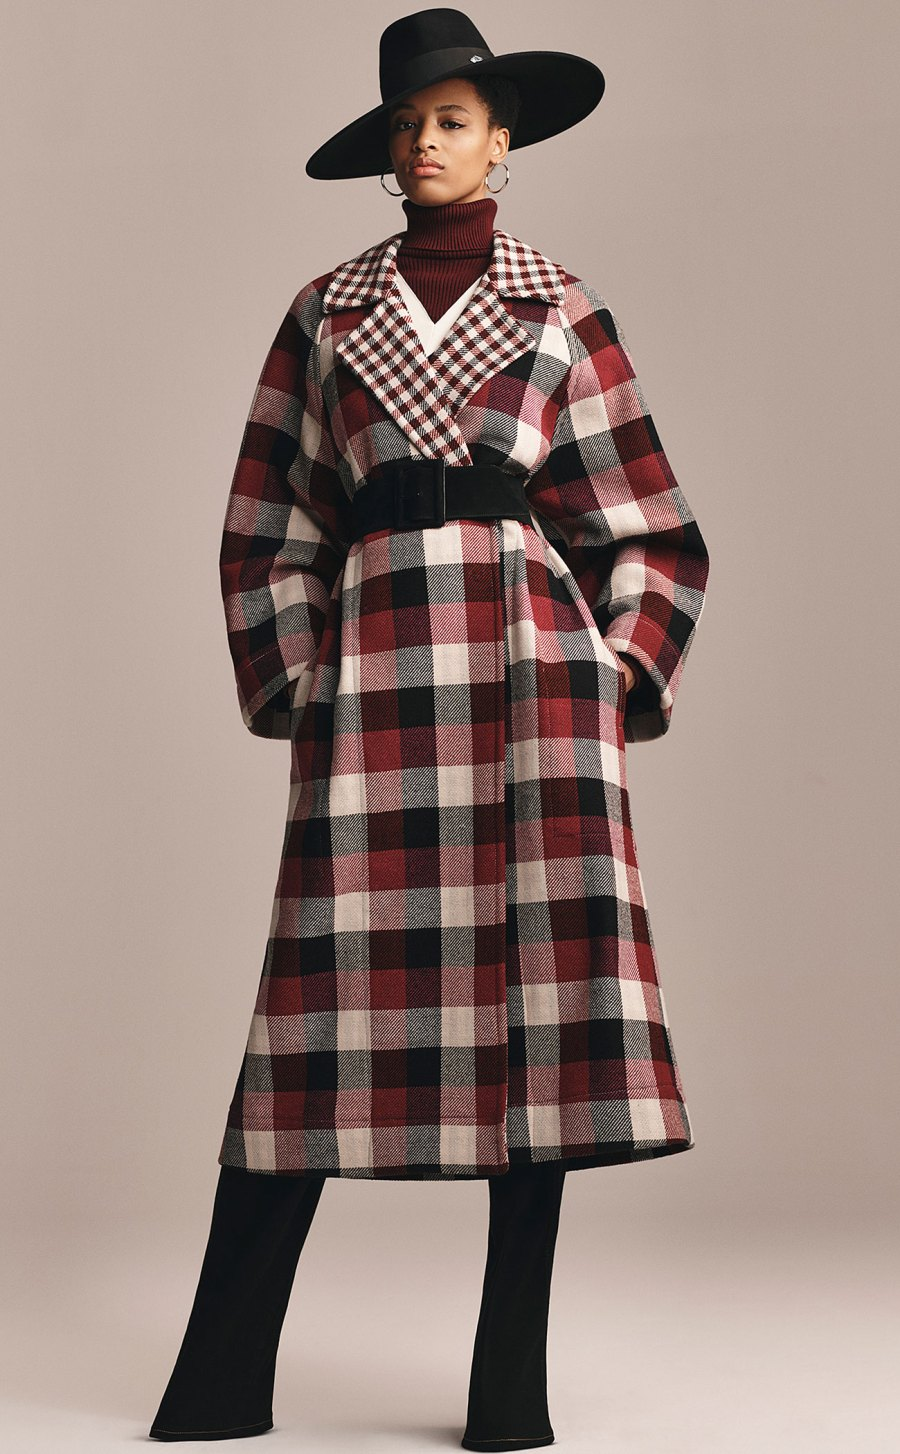 Zendaya x Tommy Hilfiger Collection - Zendaya Check Coat